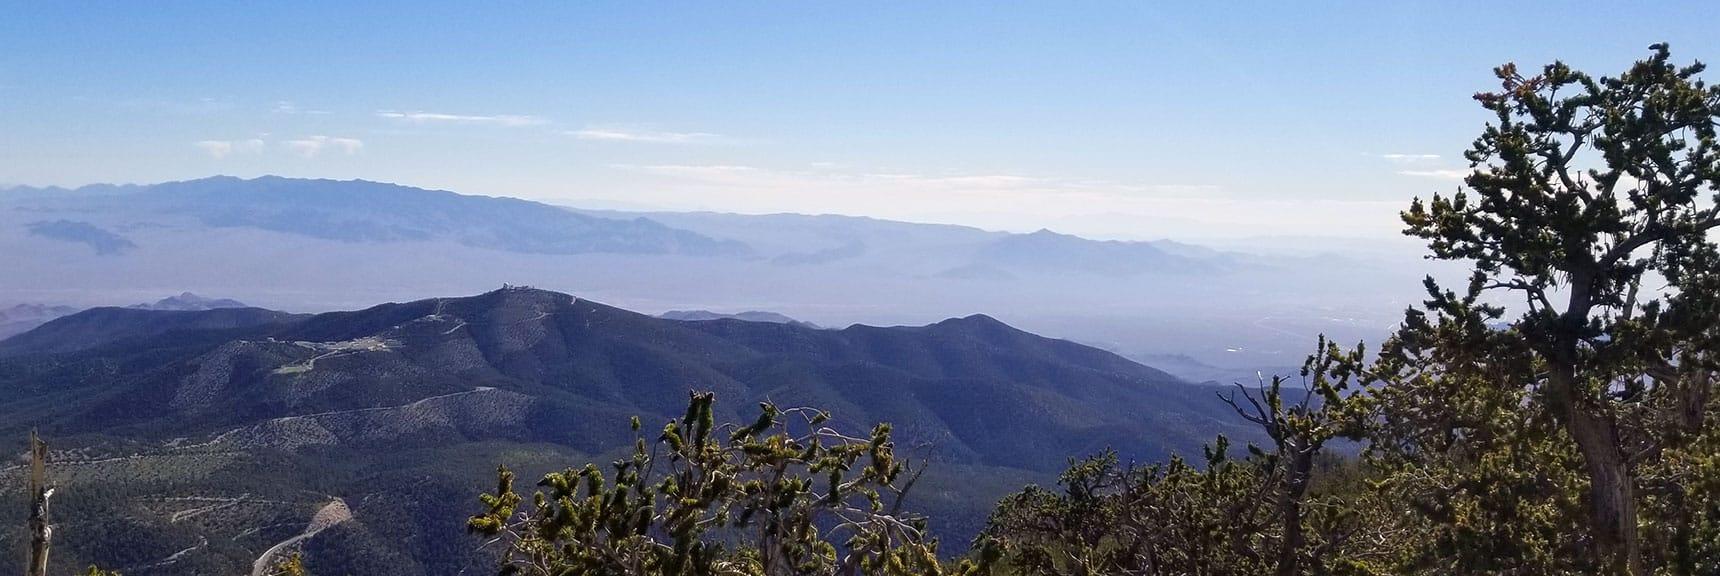 Mt Charleston Observatory with Desert National Wildlife Refuge in Background View from Fletcher Peak